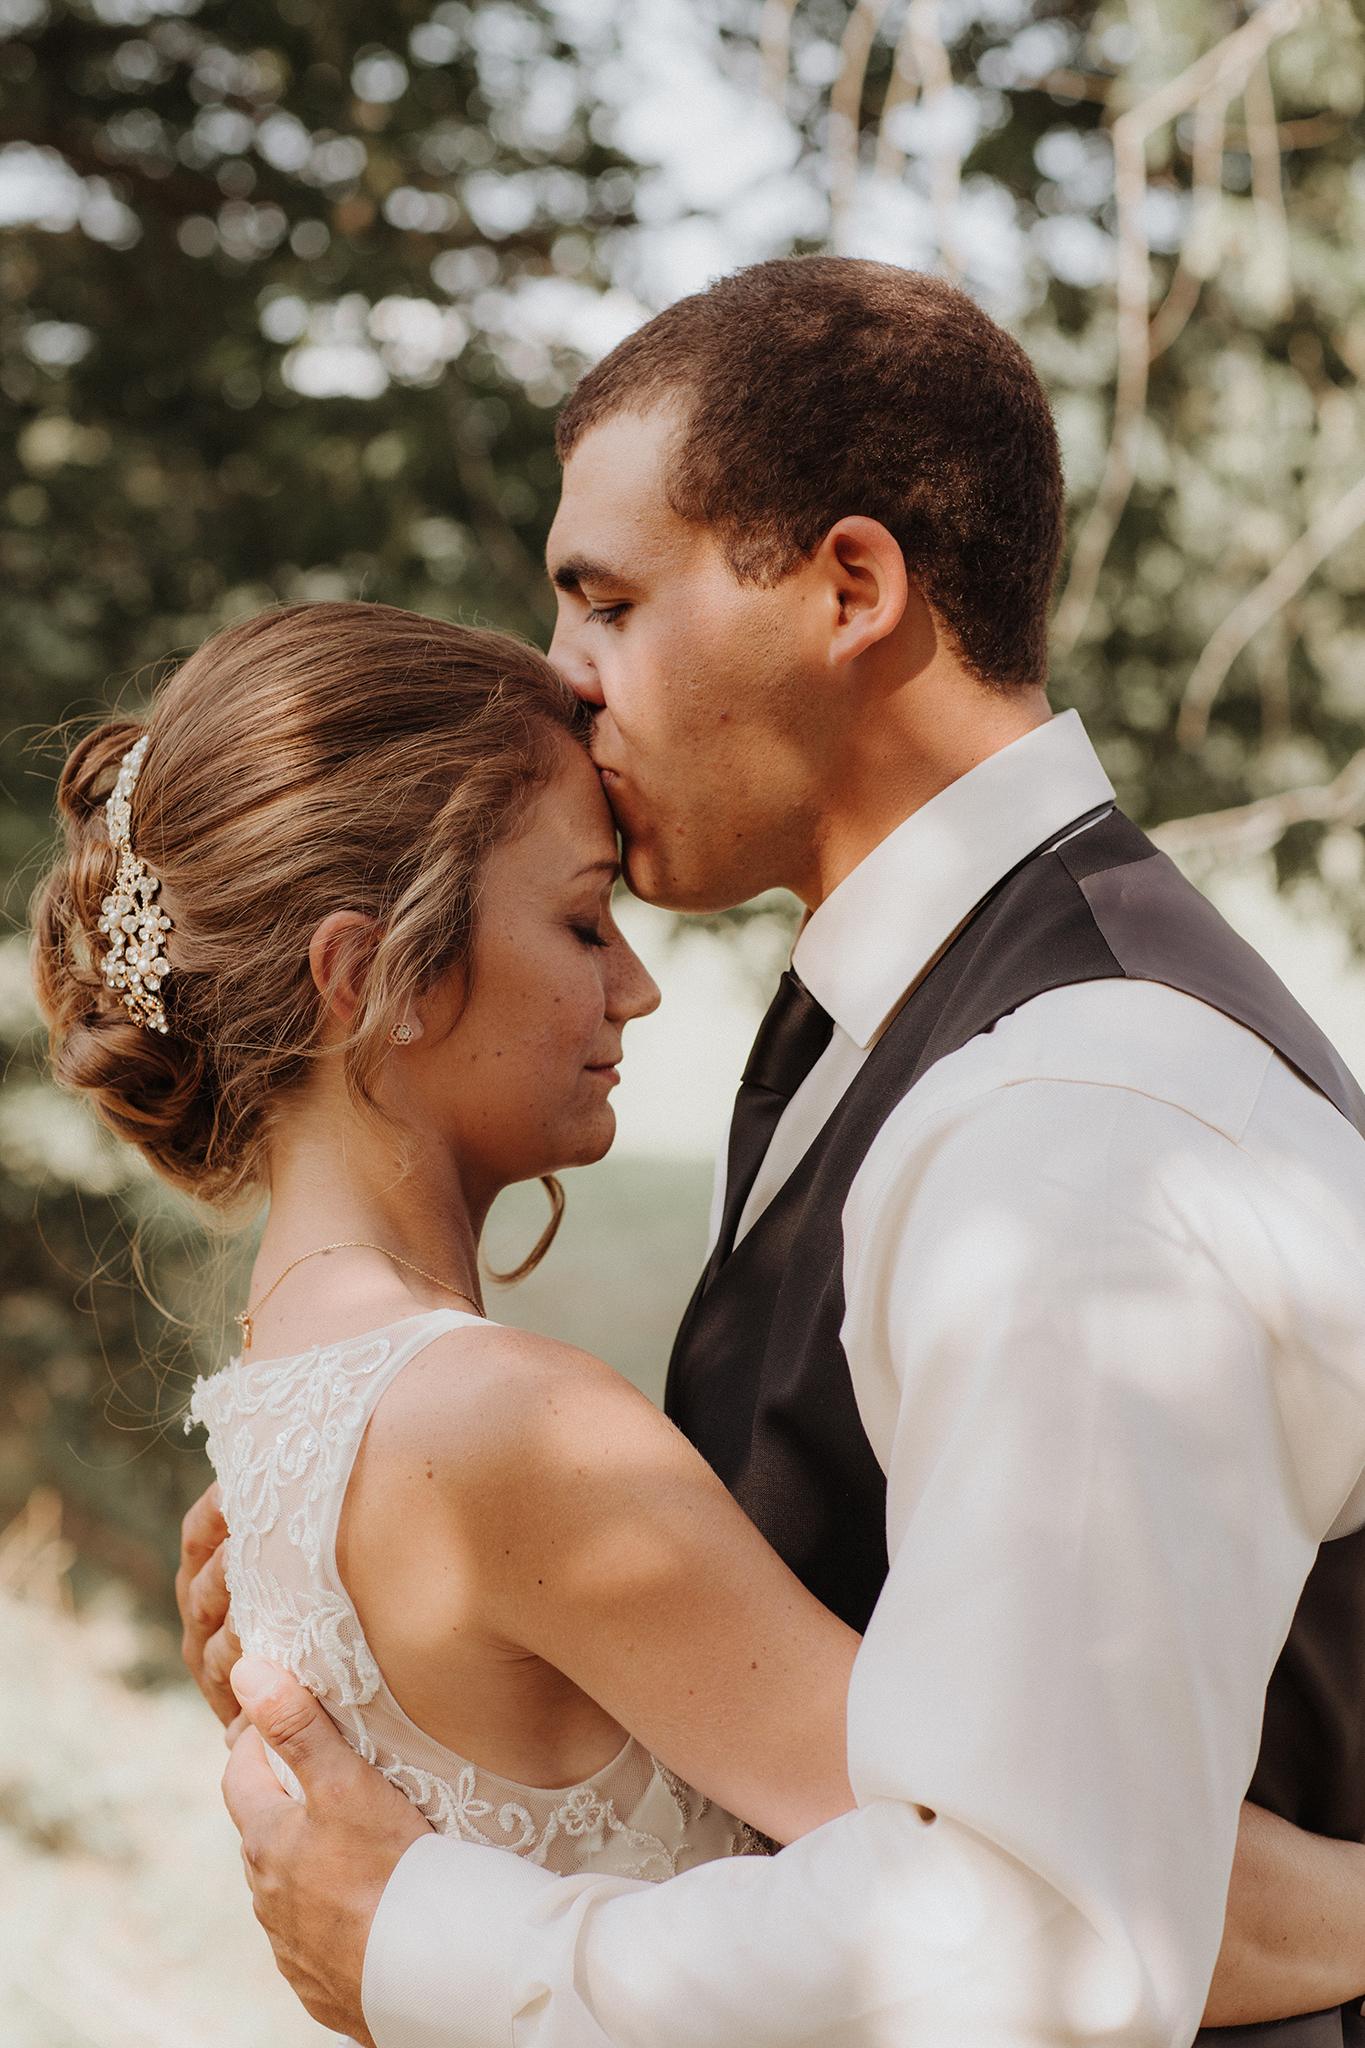 vermont-wedding-photographer-outdoor-farm-wedding-42.jpg